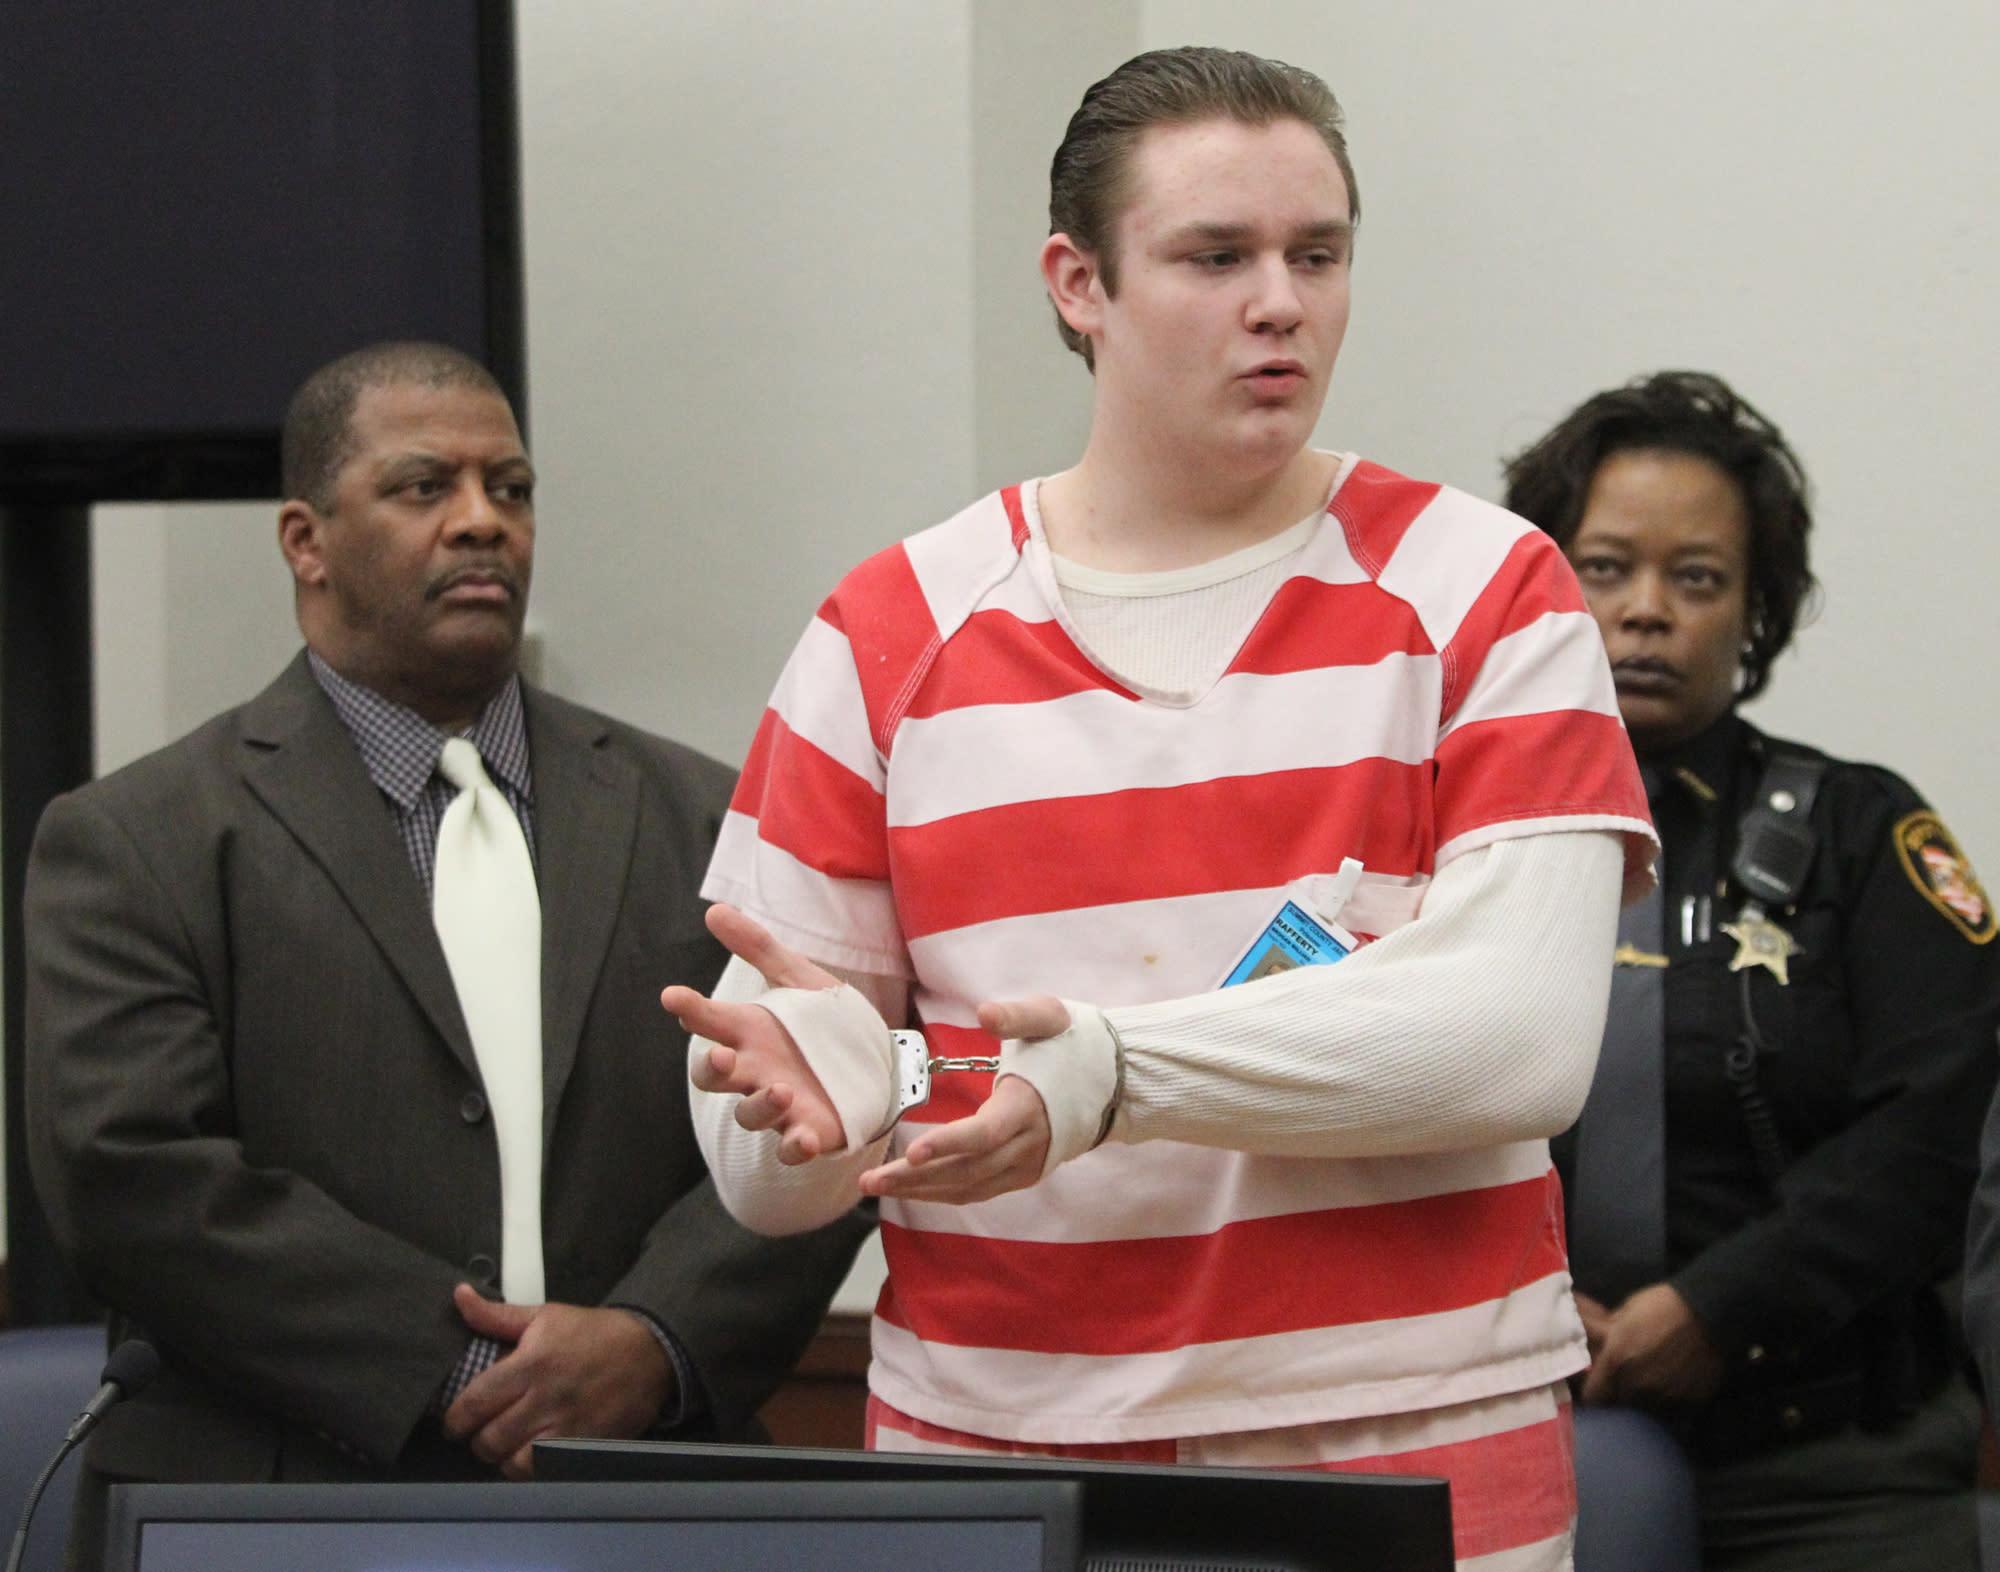 Ohio teen sentenced to life over Craigslist plot